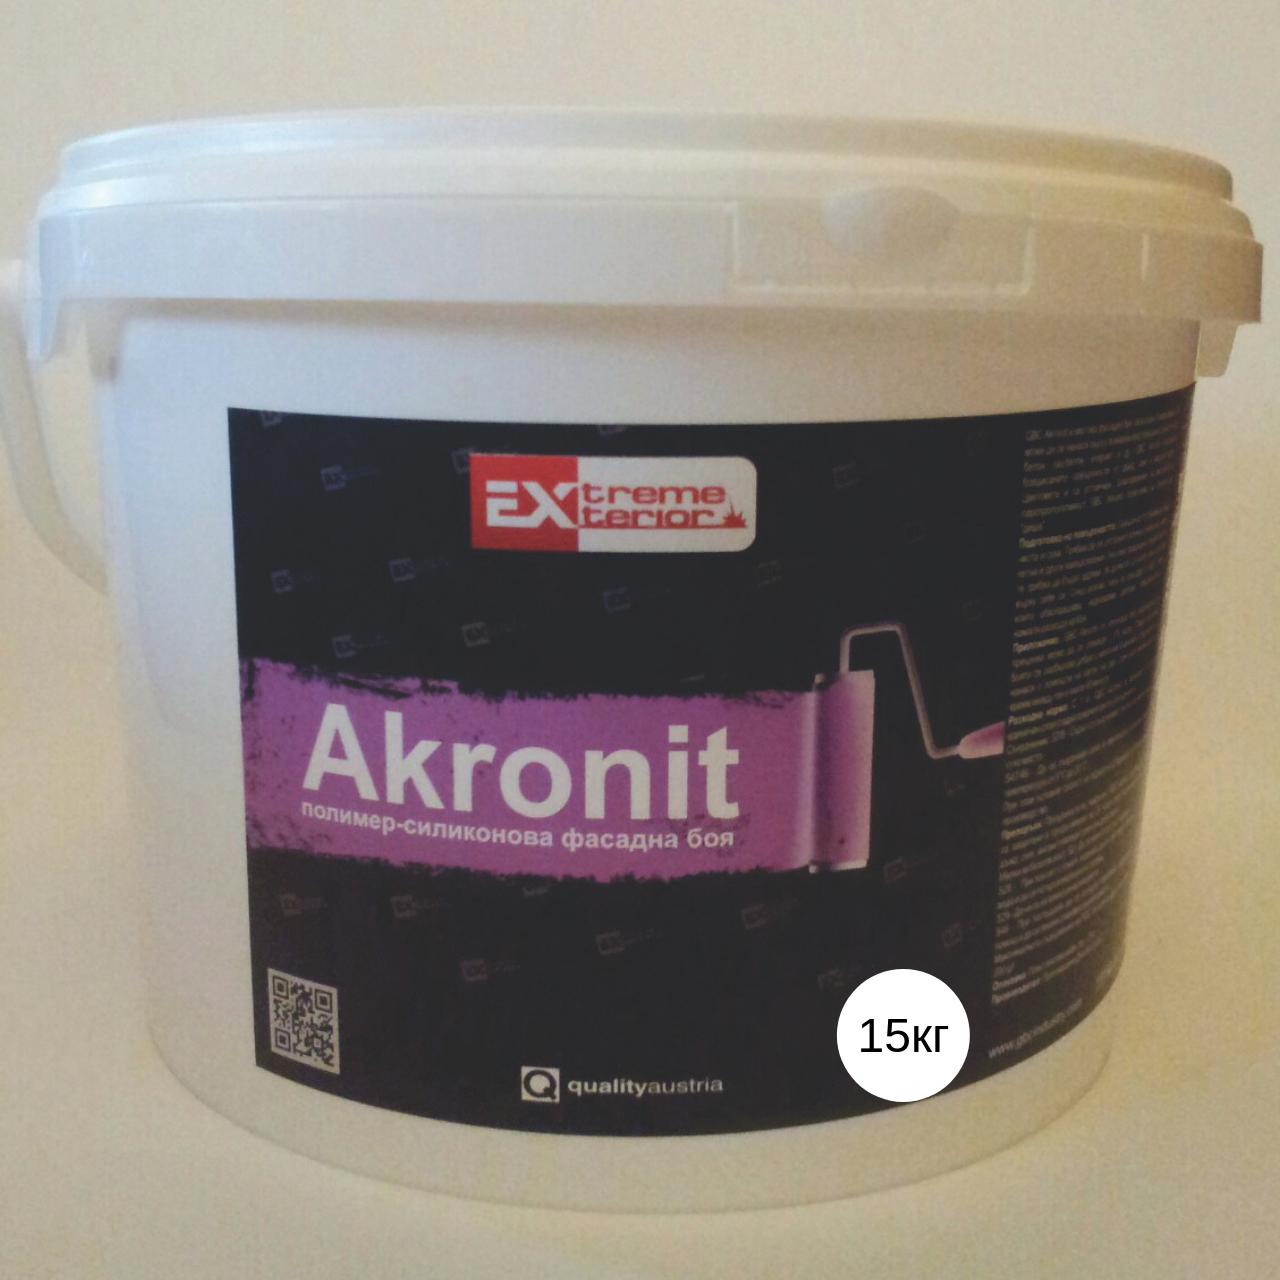 Силиконовая фасадная краска Gbs Akronit 15кг (Австрия - Болгария)